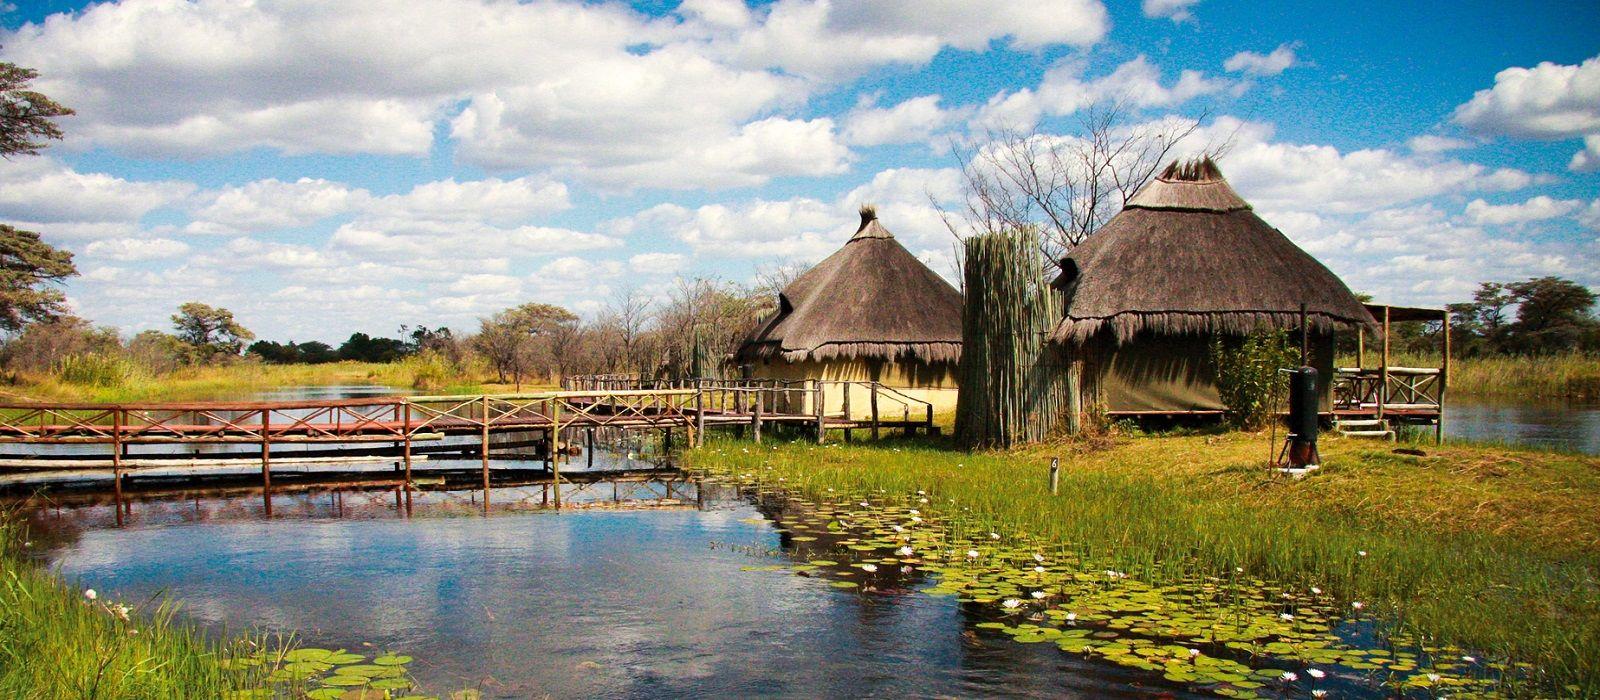 Hotel Camp Kwando Namibia